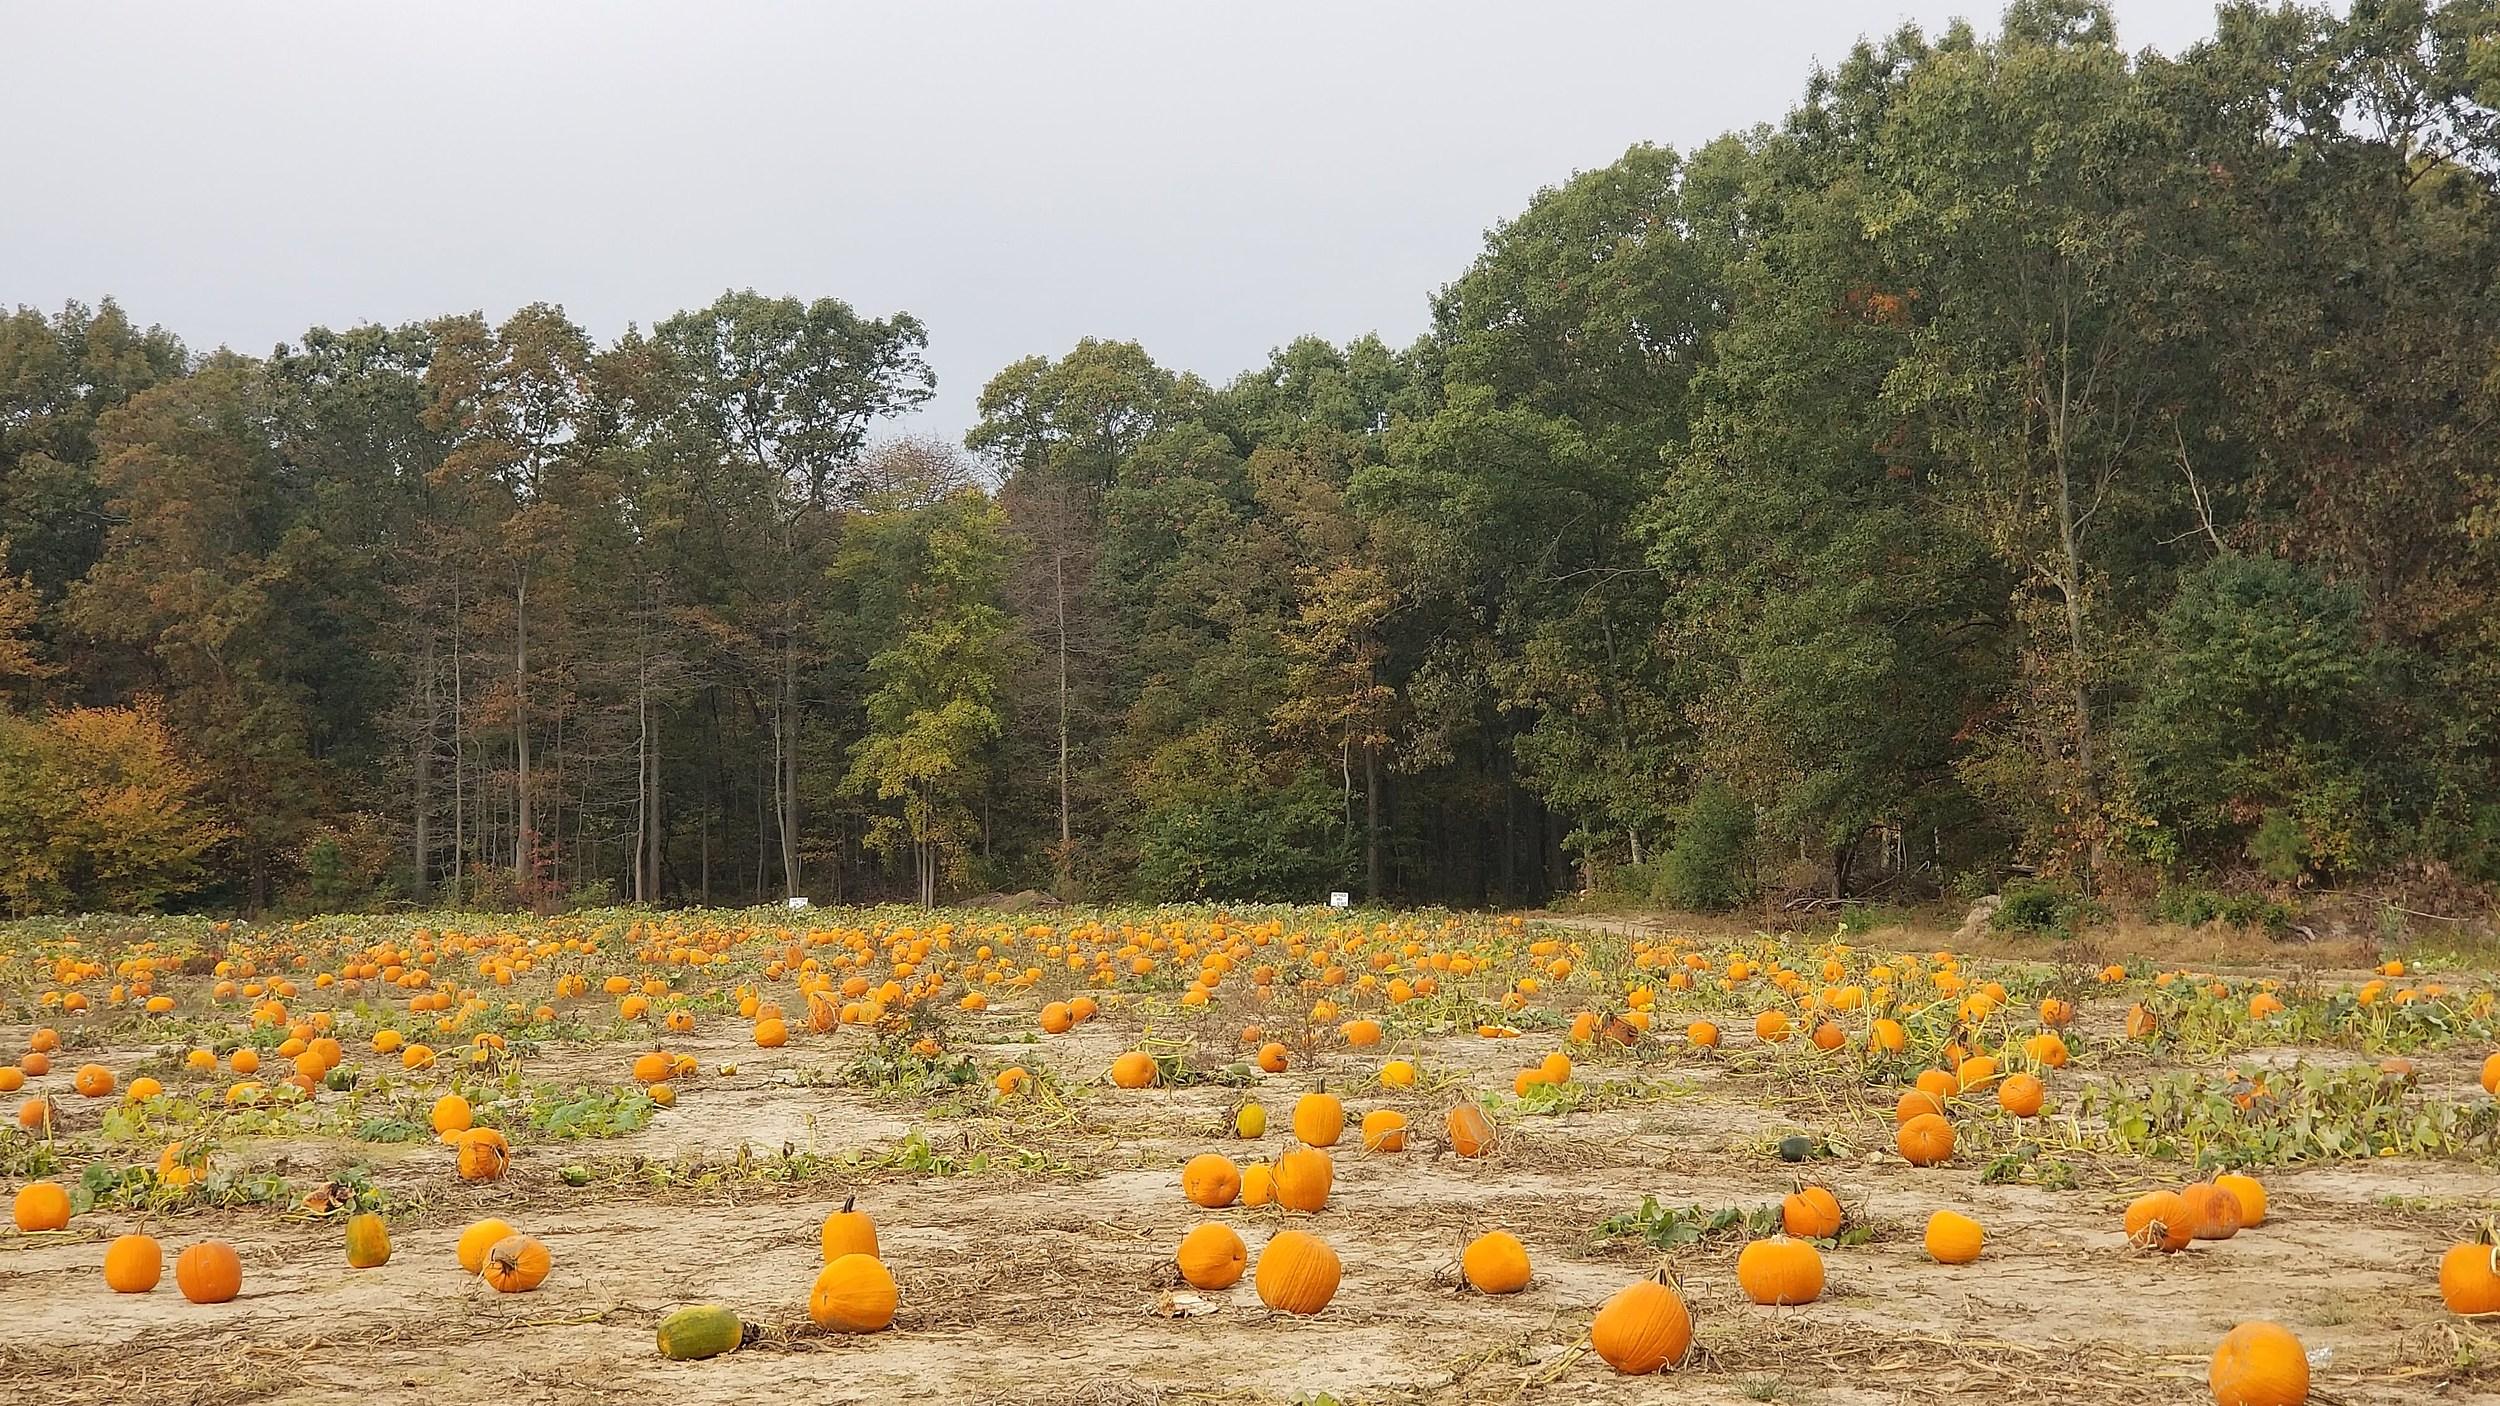 Dry and seasonable weather Monday – rain returns to NJ Tuesday